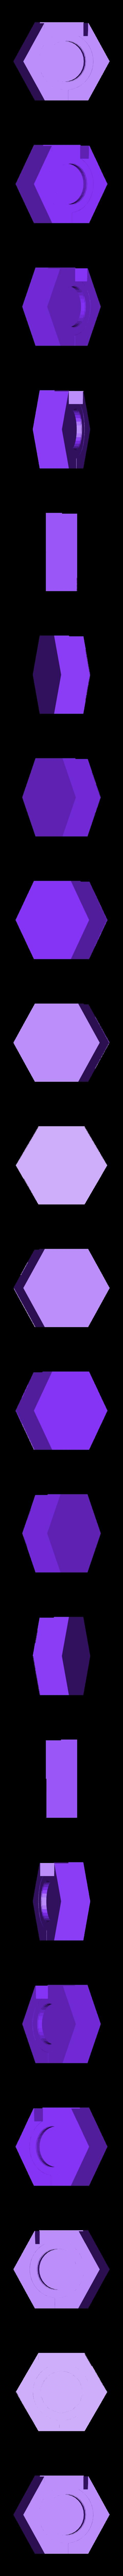 stand.stl Download free STL file Kepler • 3D printer template, spac3D